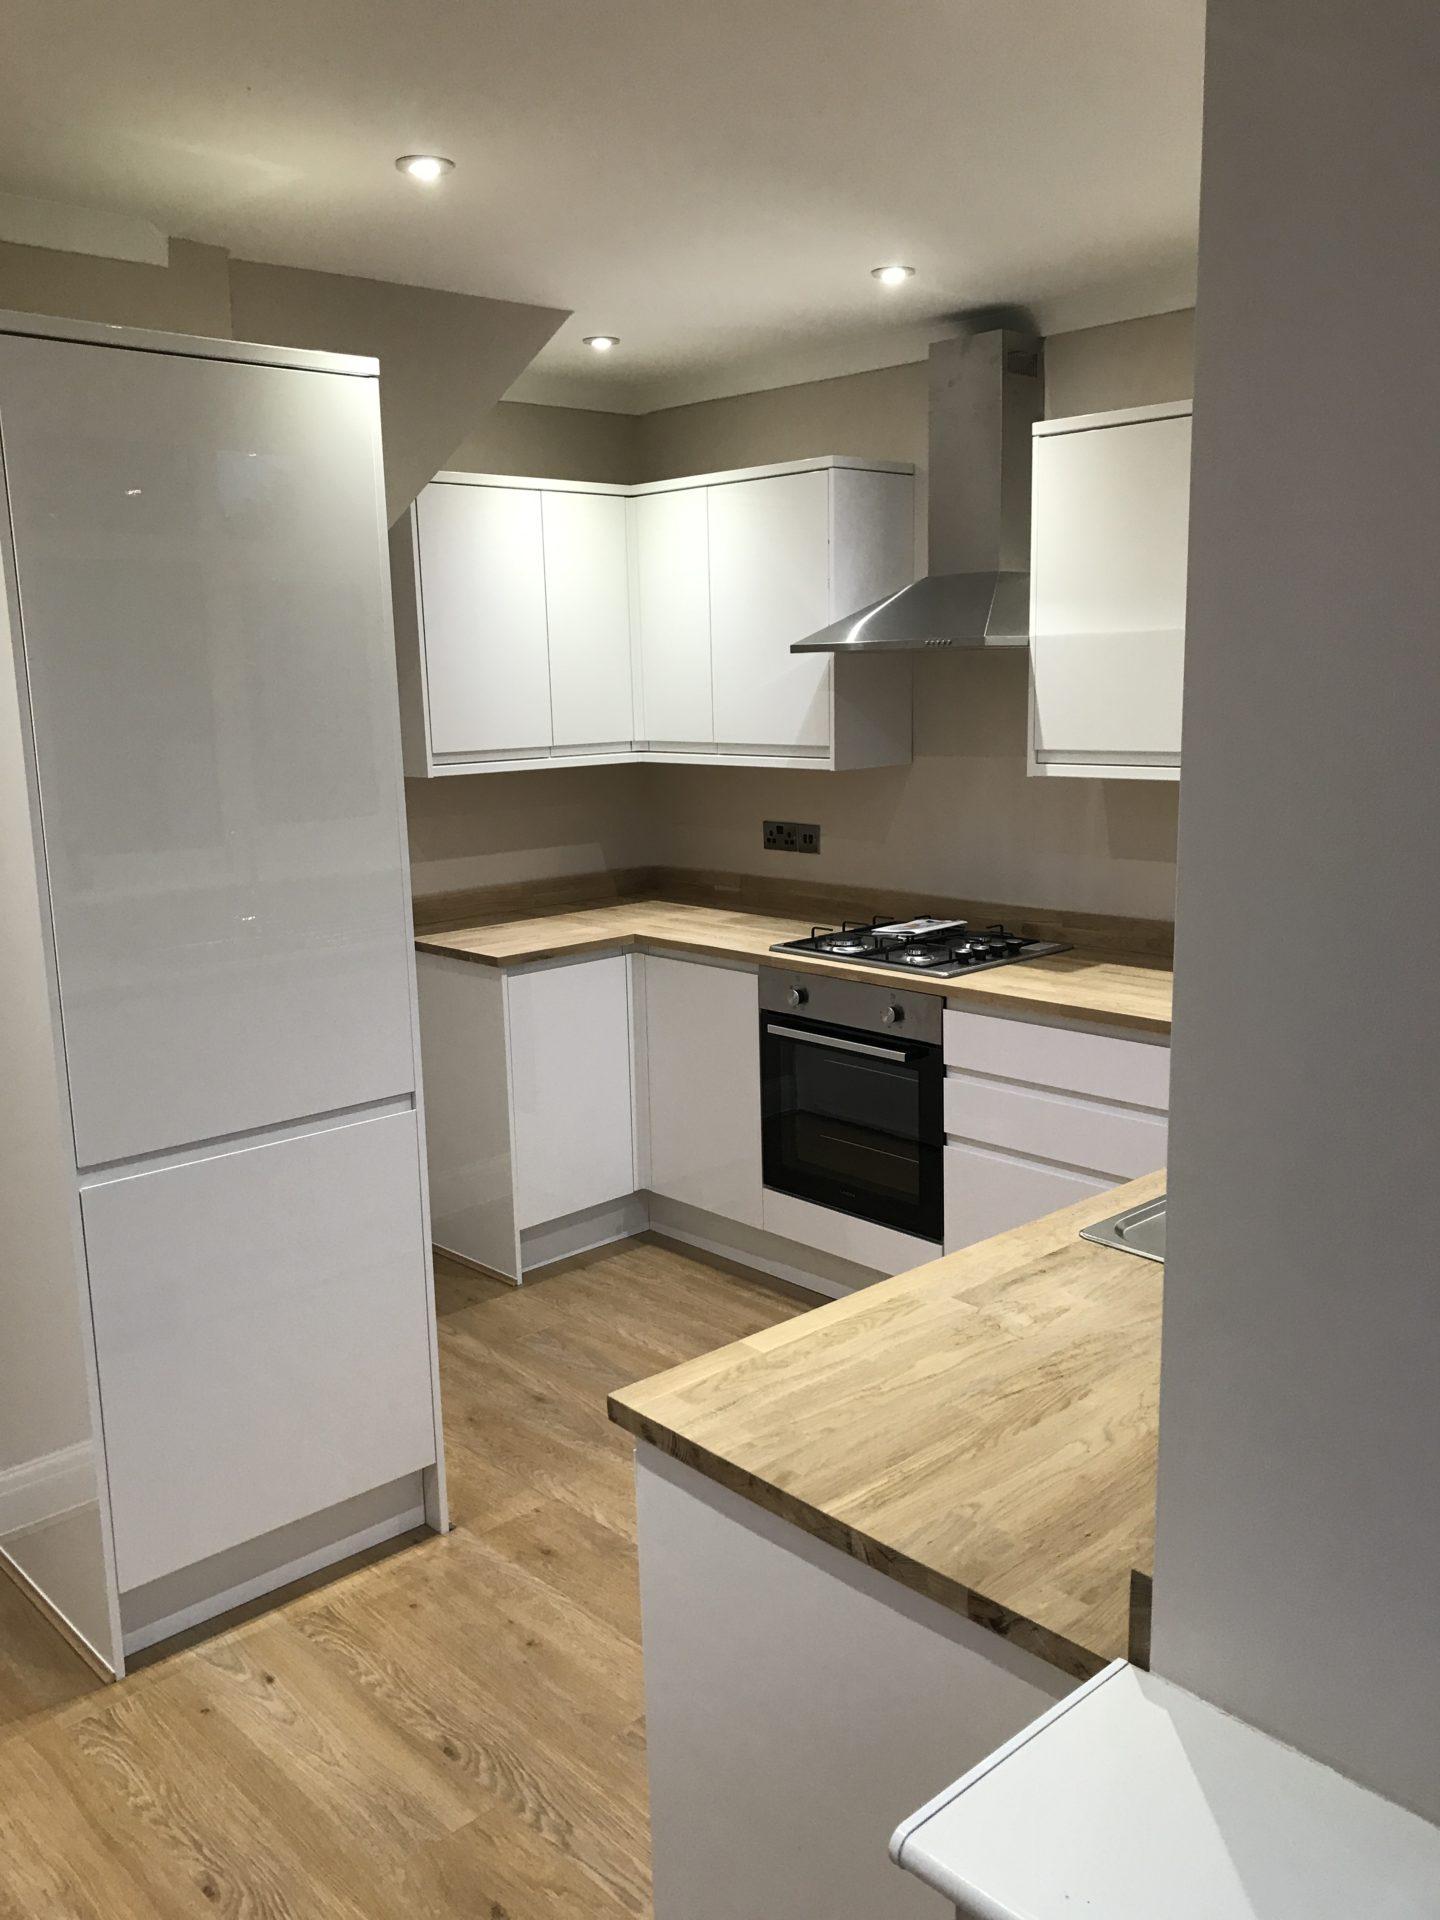 Full House Refurbishment Kent